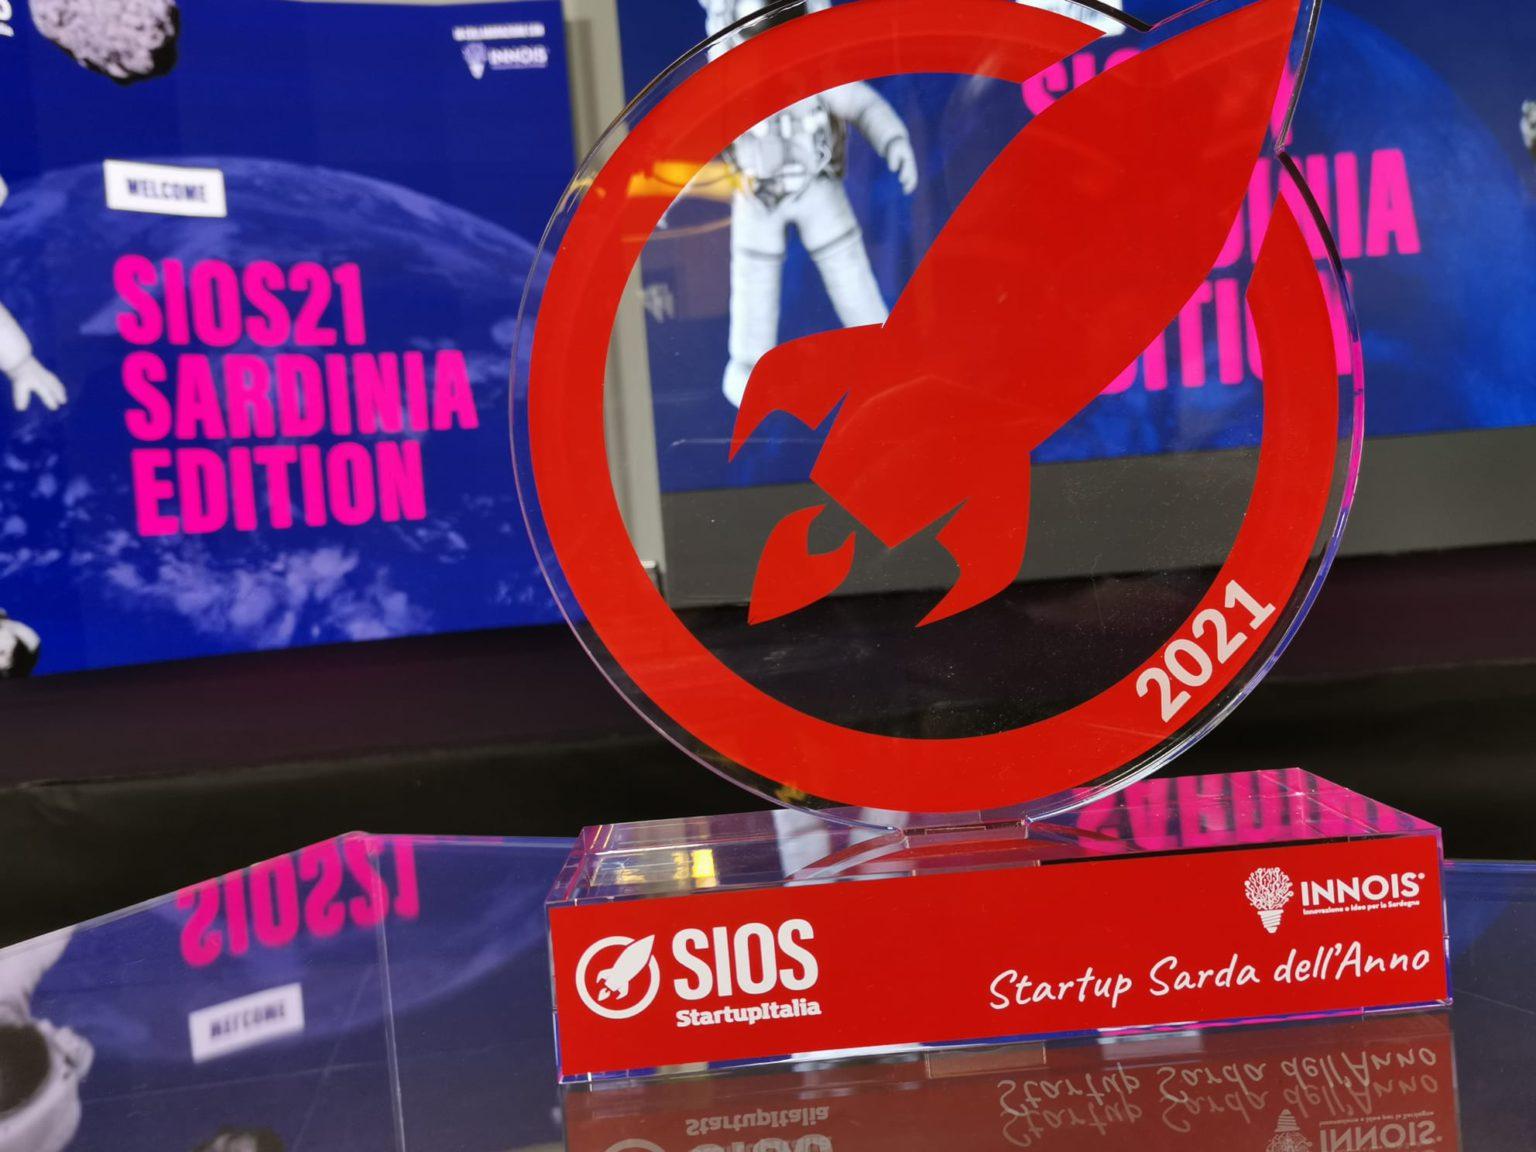 SIOS21 Sardinia Edition